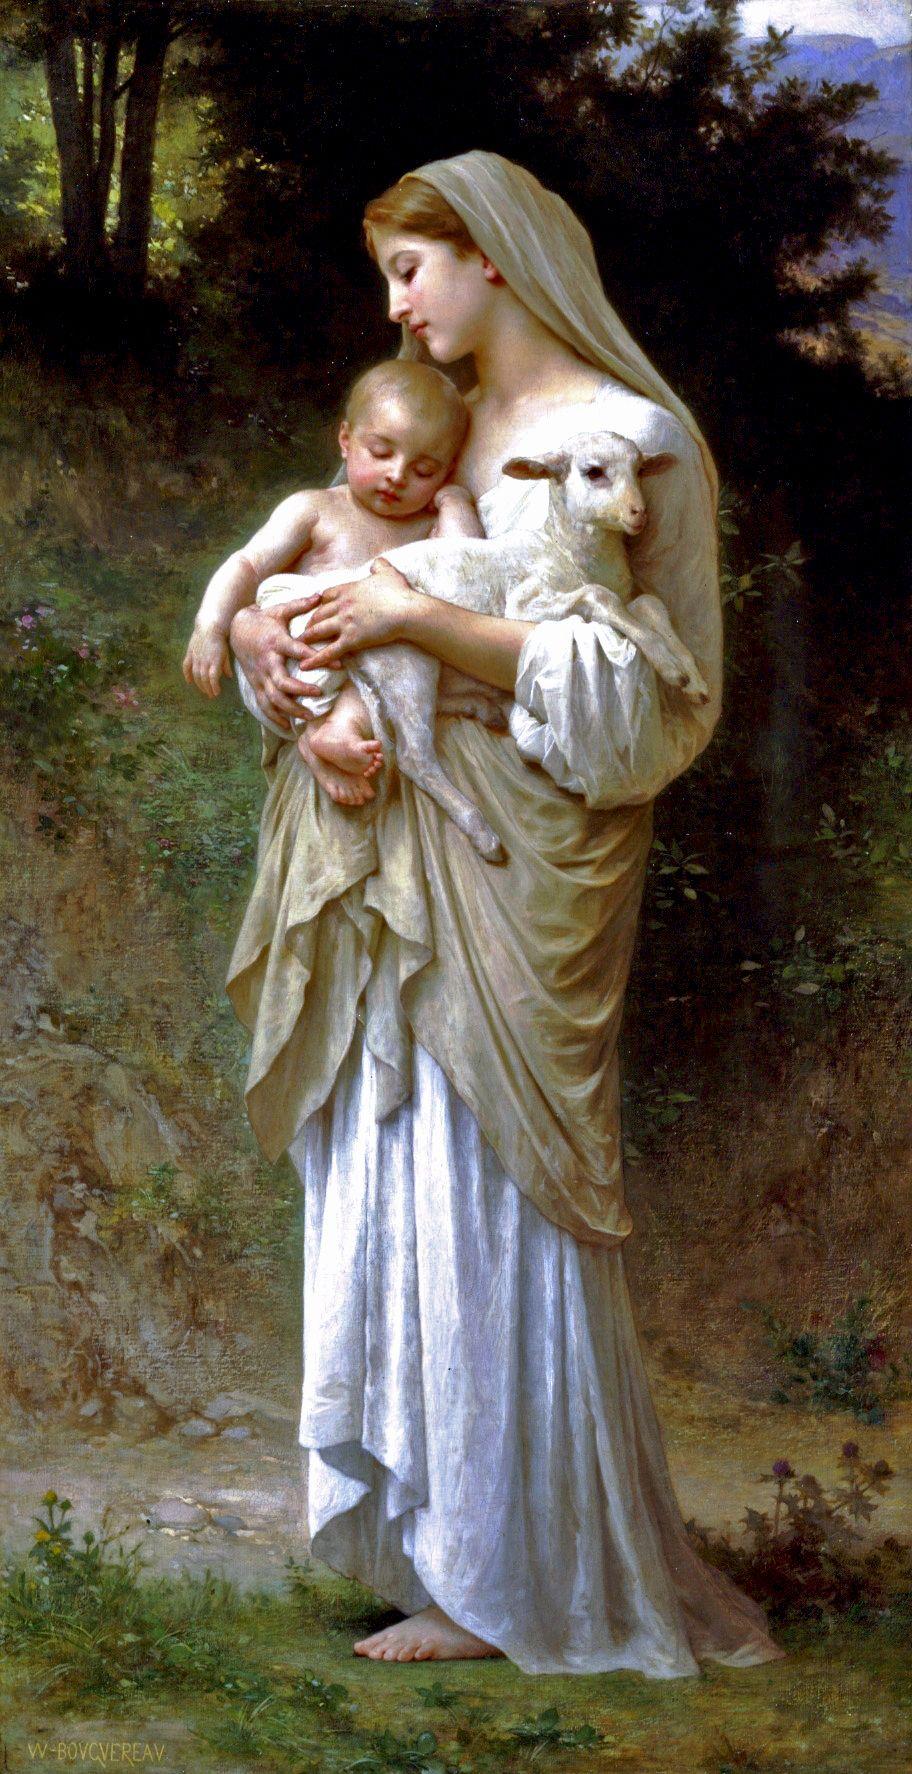 Dream of Spring, 1901 - William-Adolphe Bouguereau